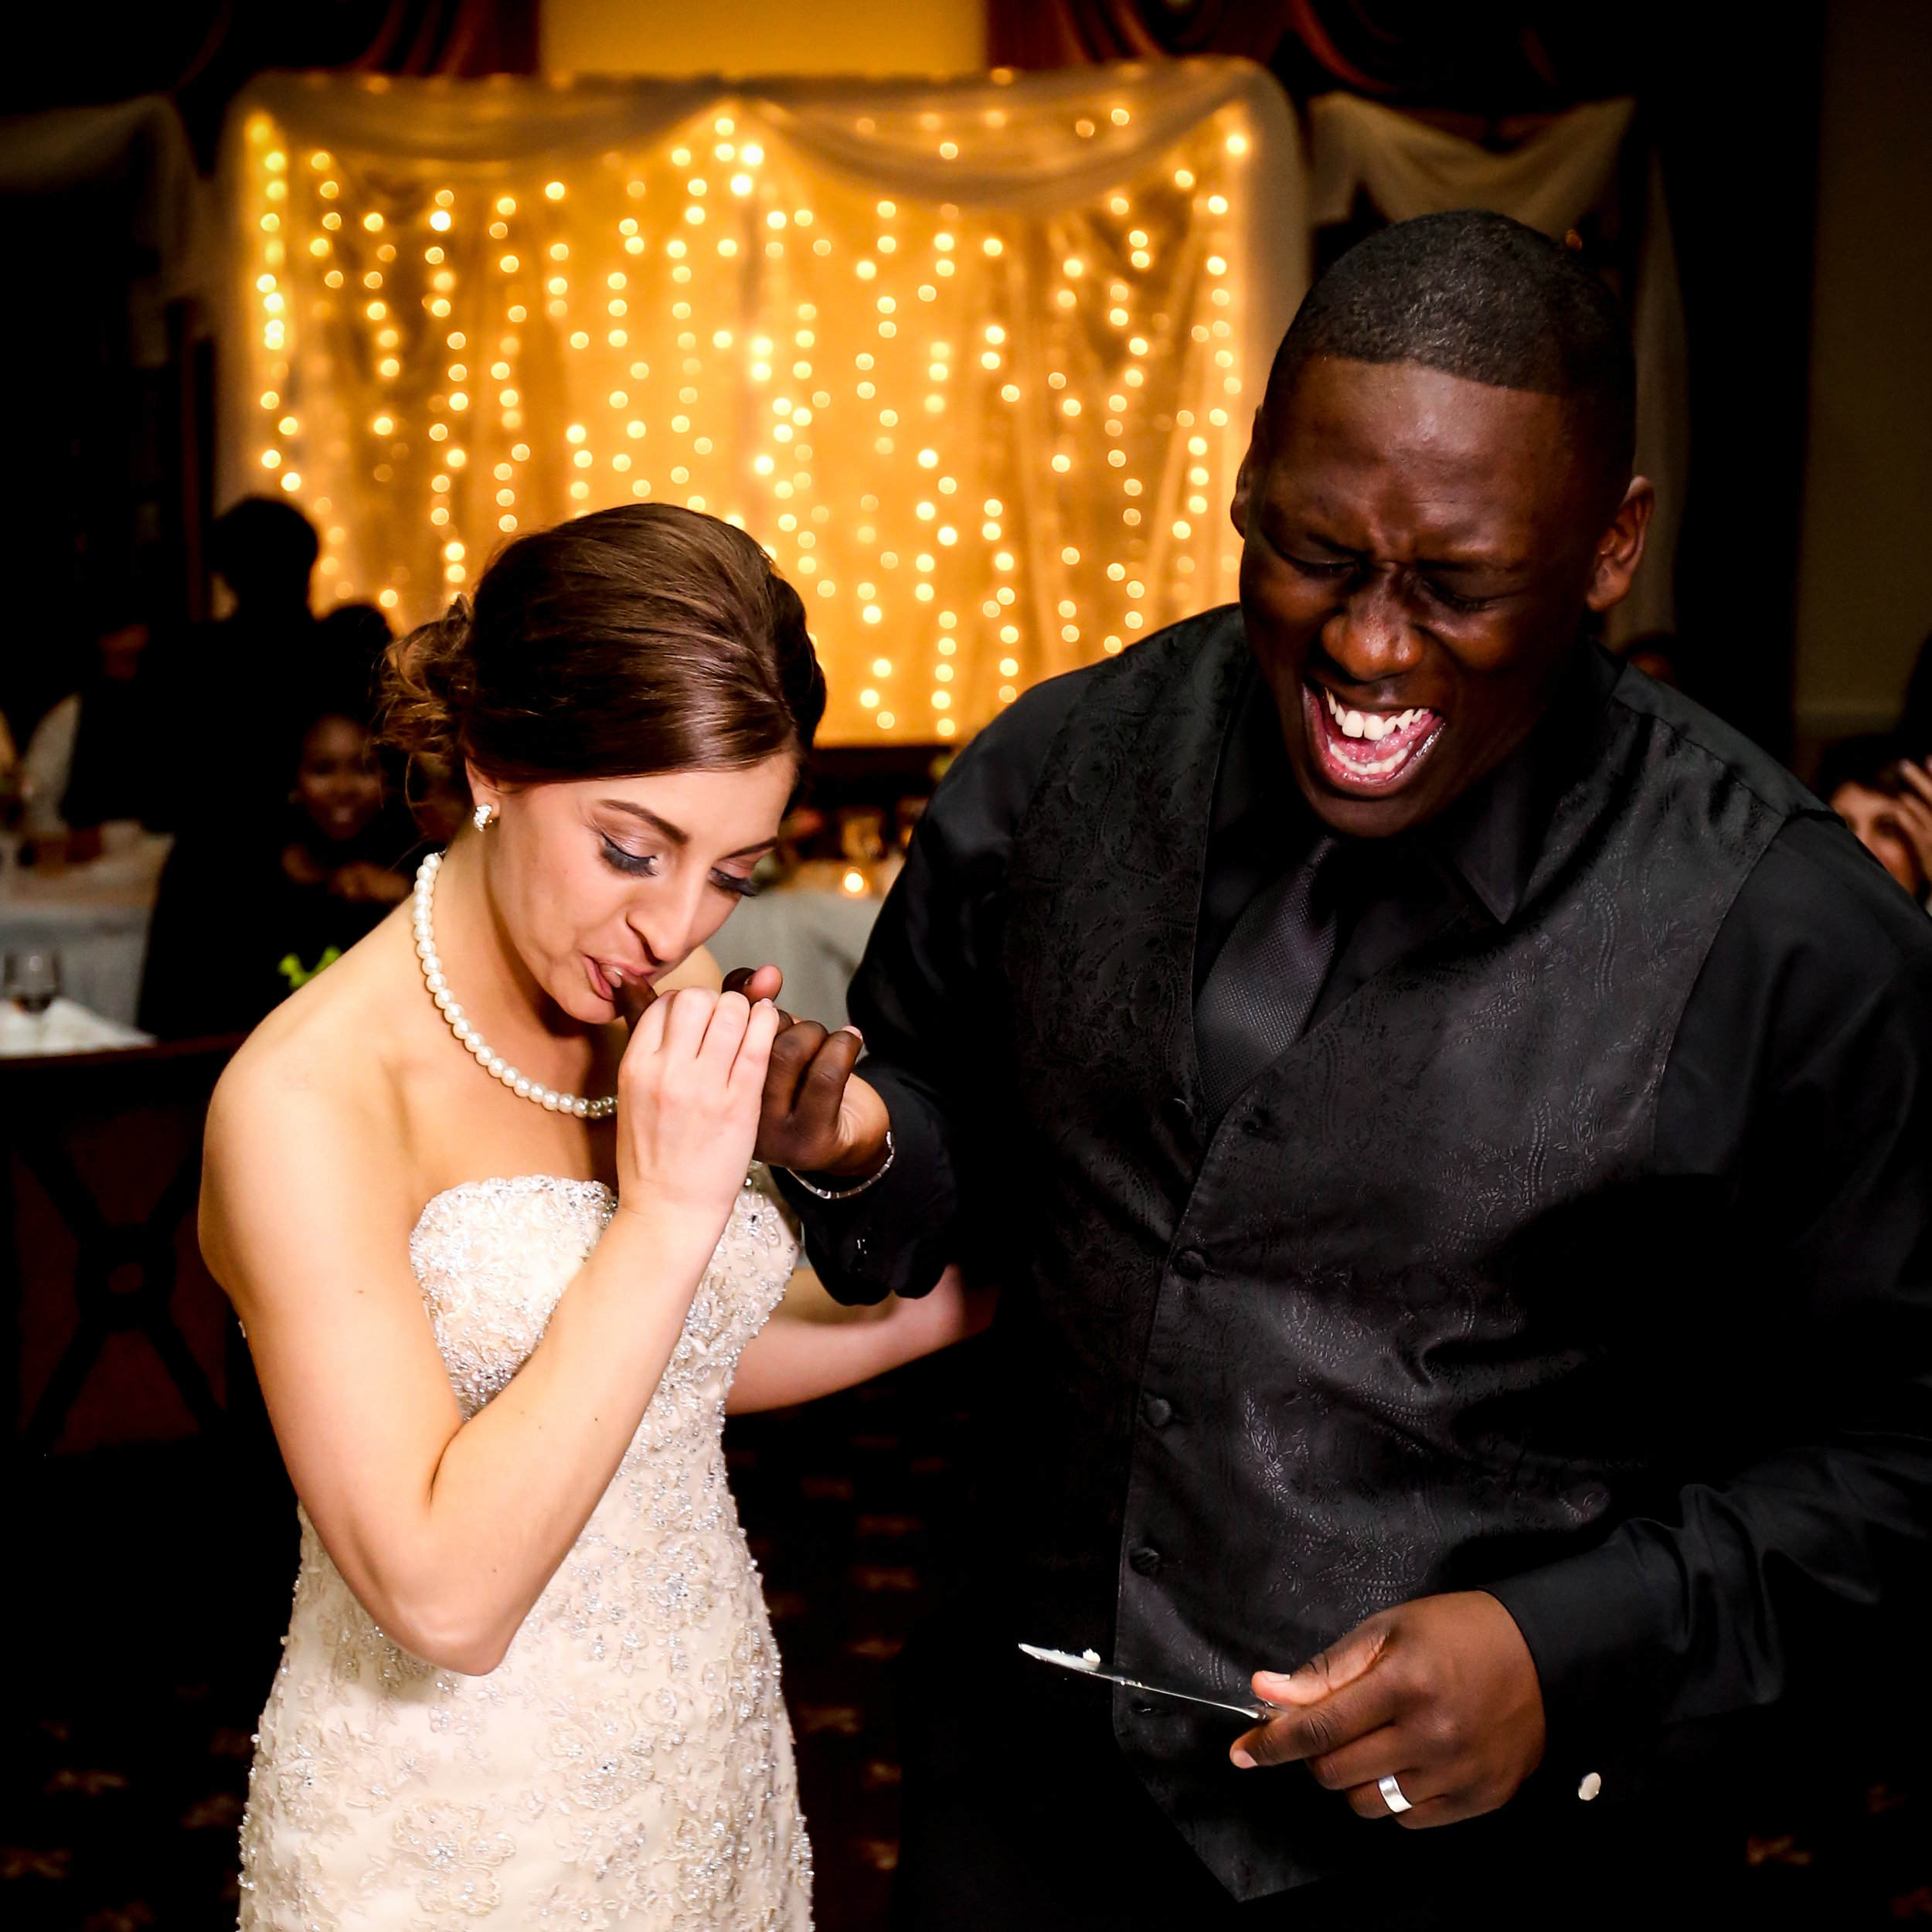 WeddingWebsite-10.jpg